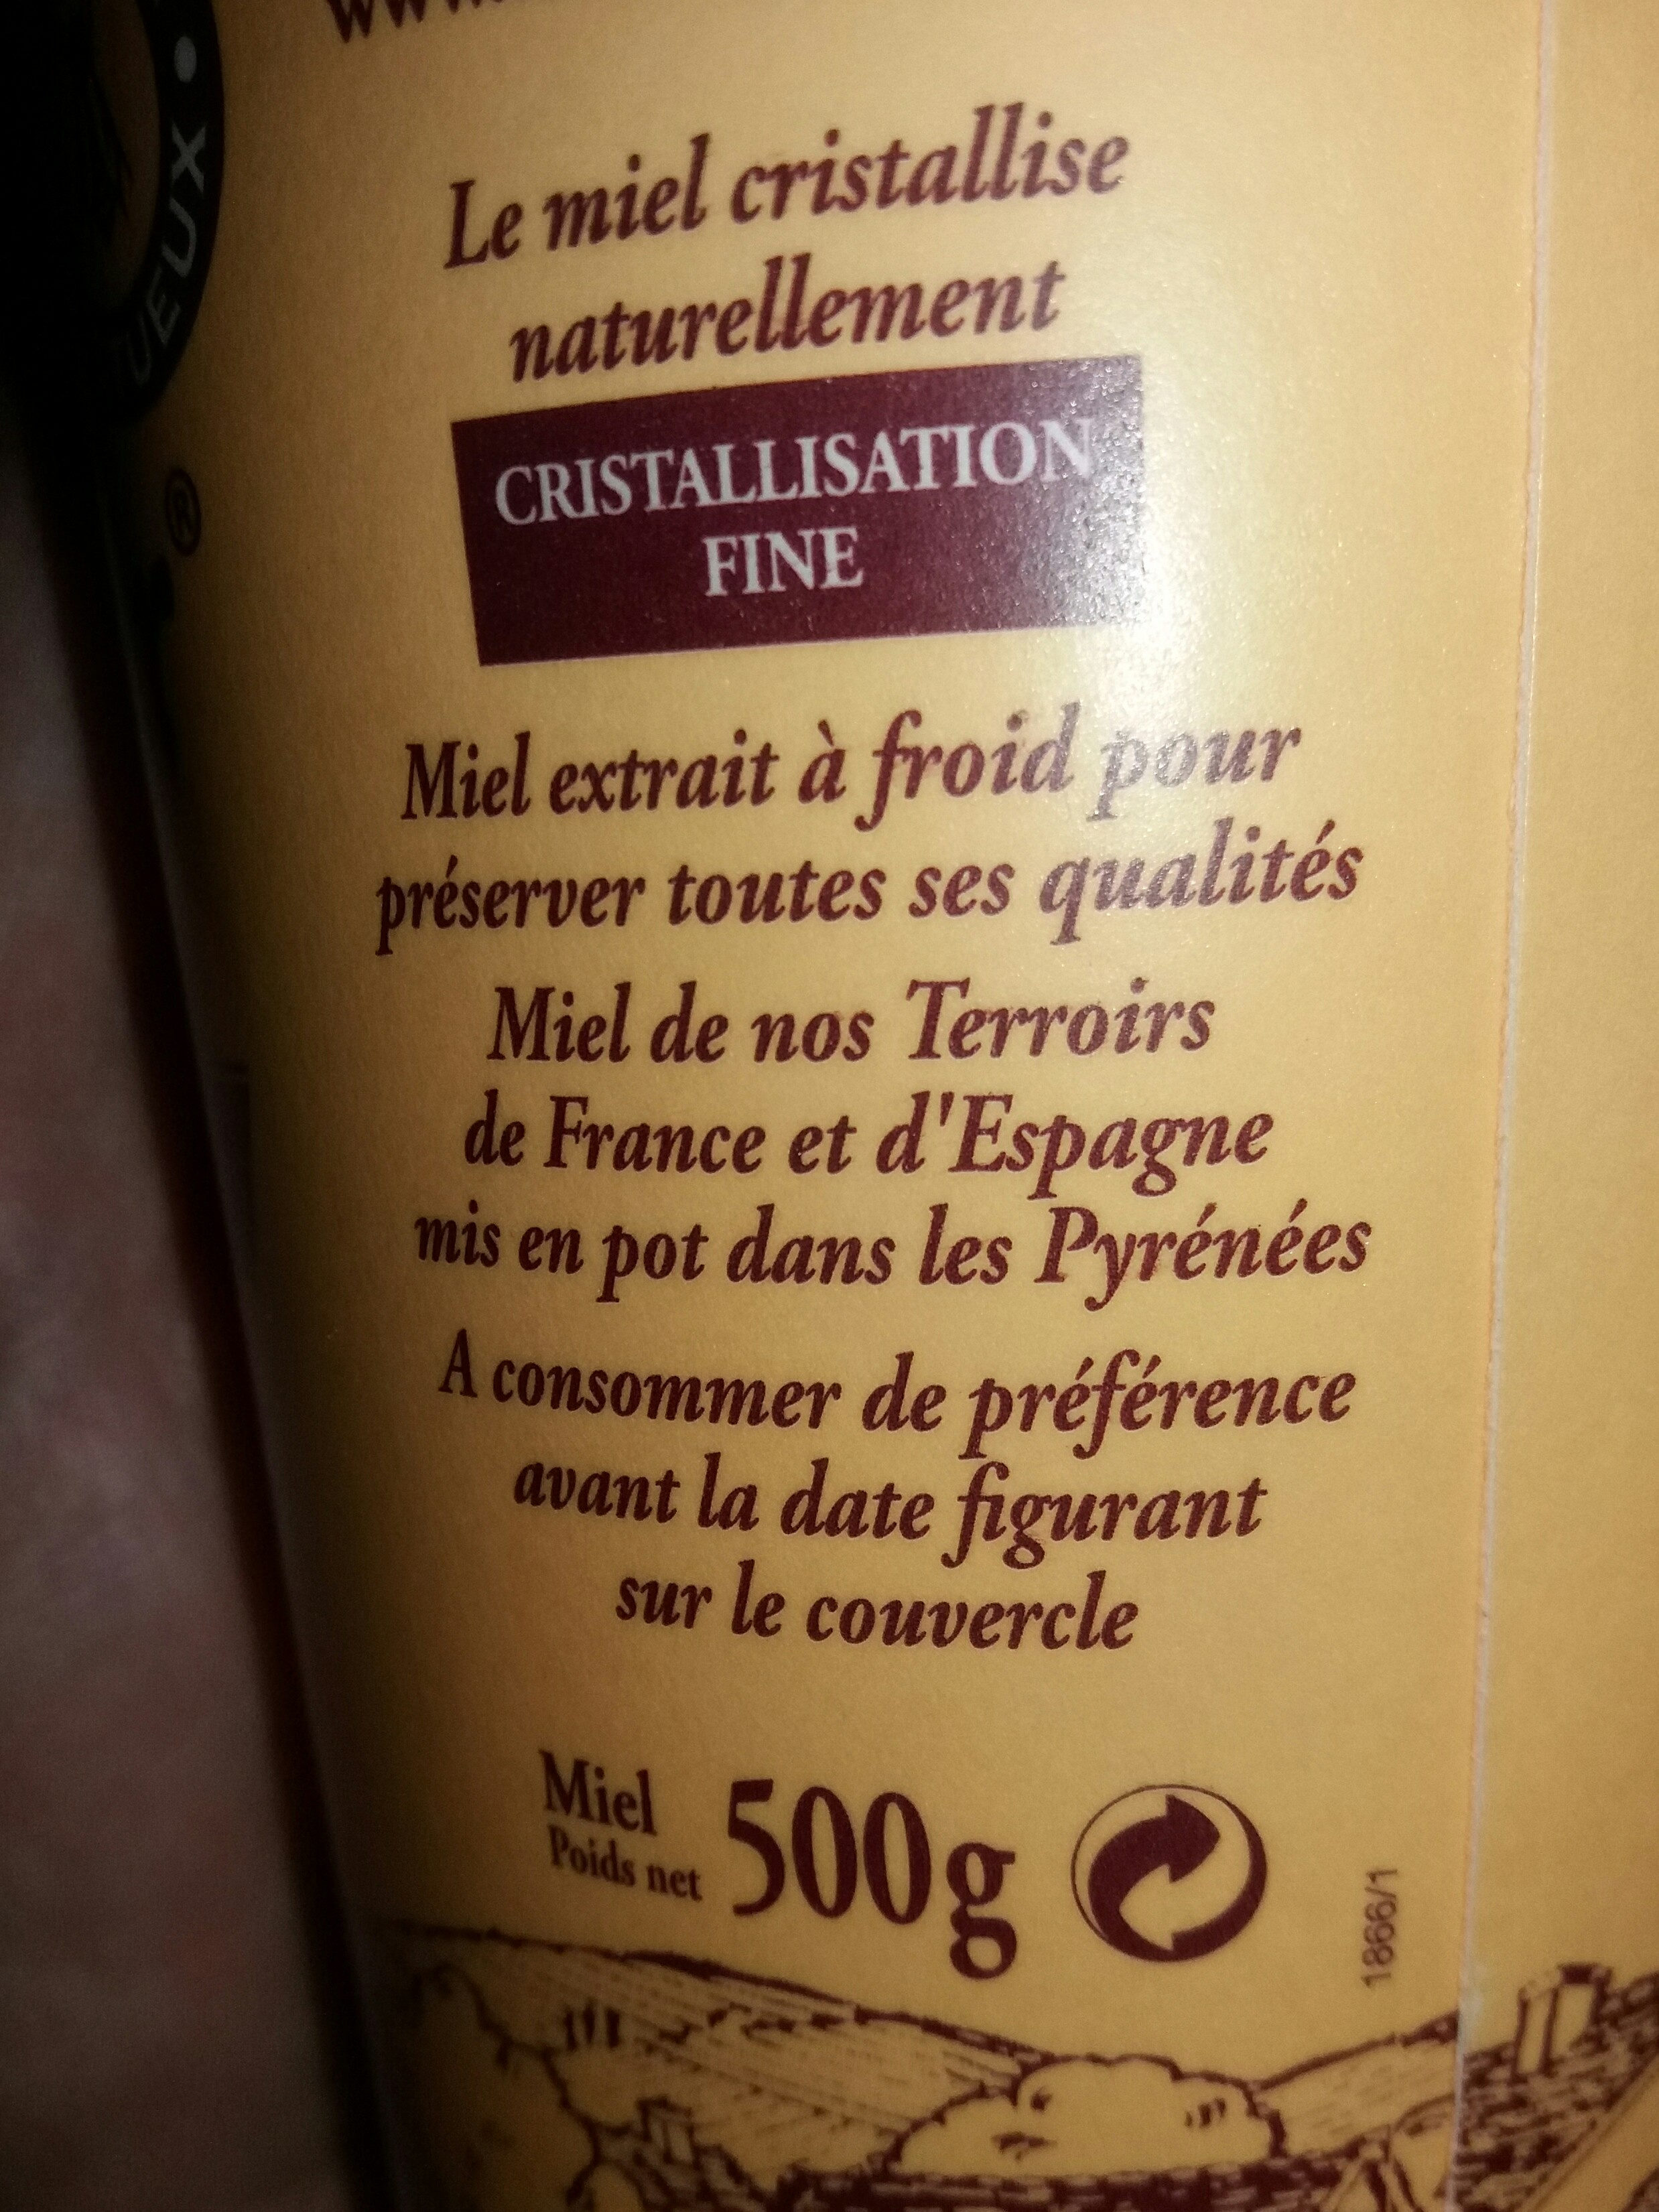 Miel l'apiculteur - Ingrediënten - fr